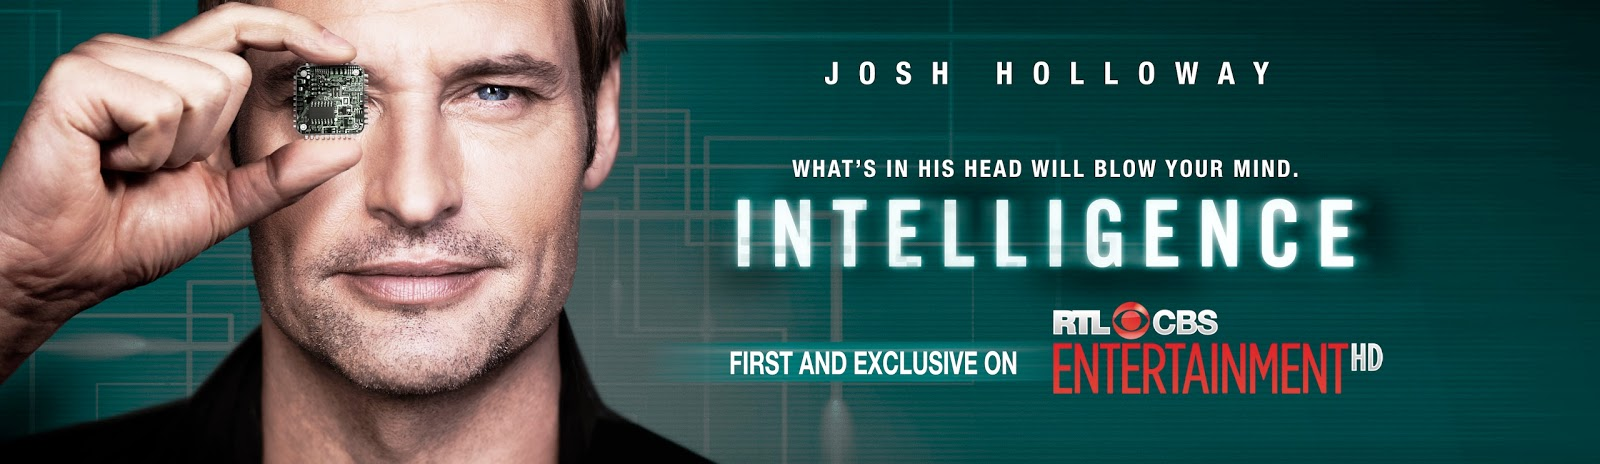 intelligence tv show